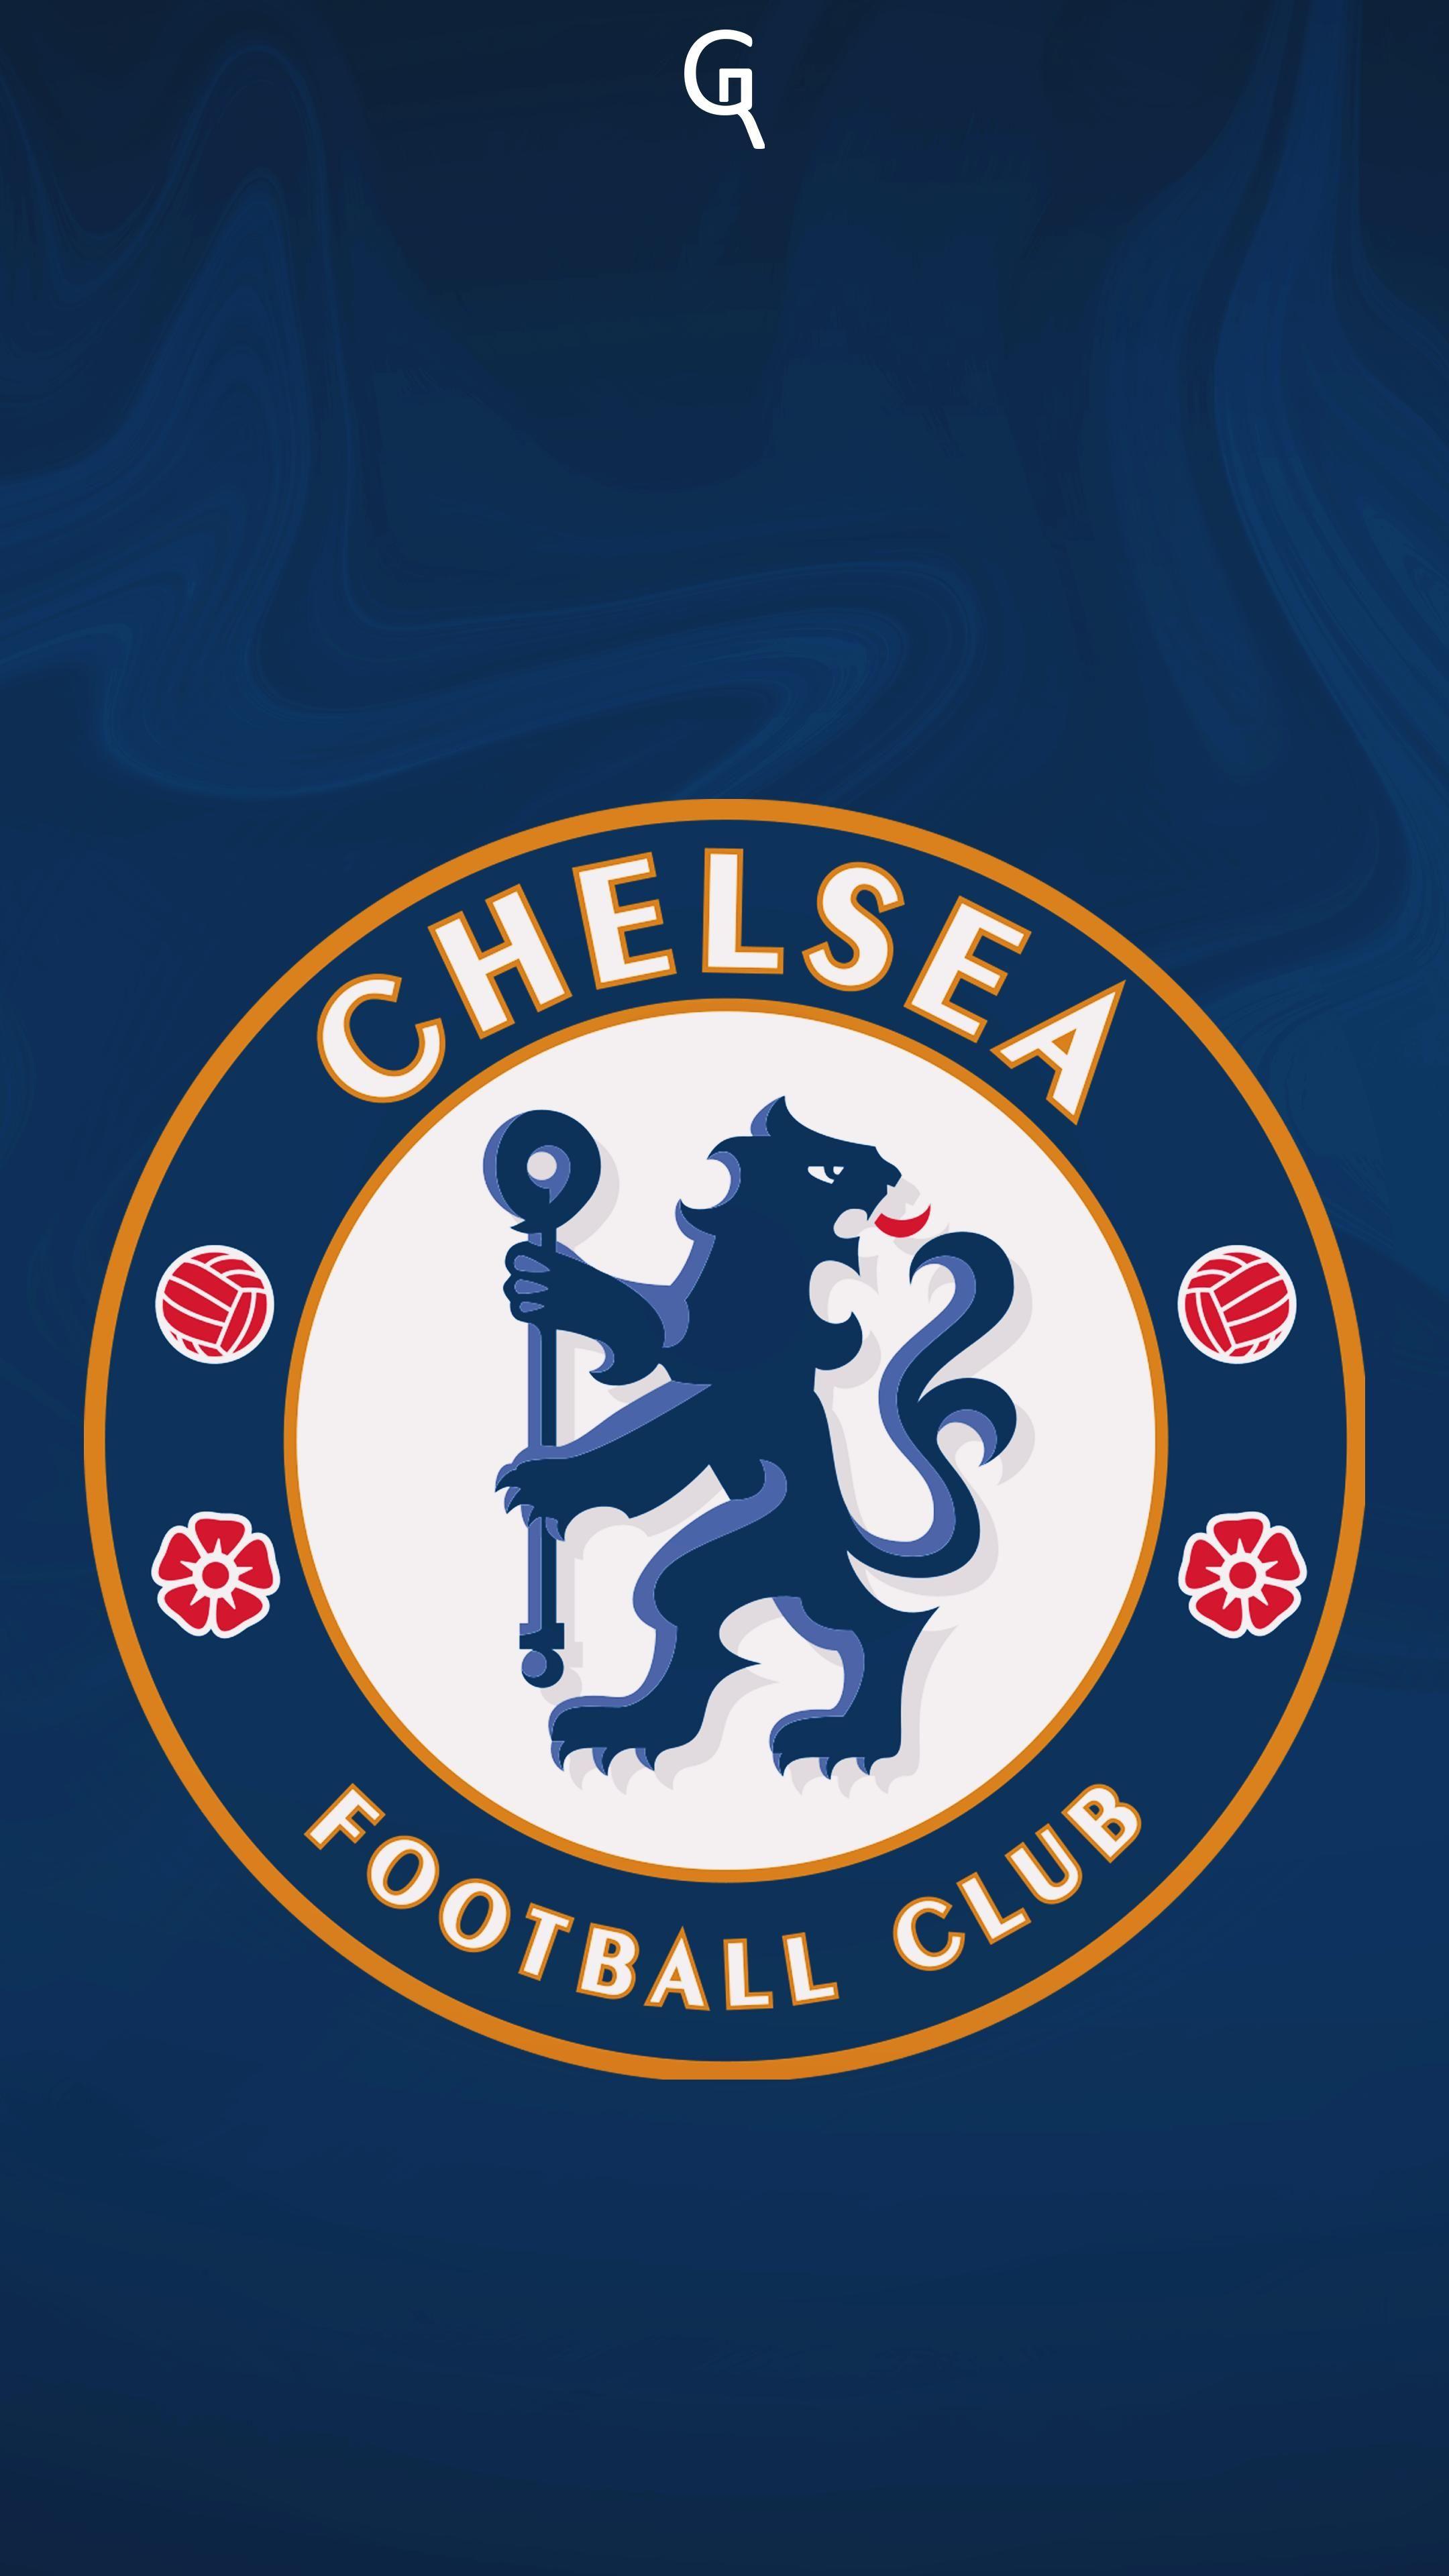 Pin Oleh T Di Chelsea Sepak Bola Gambar